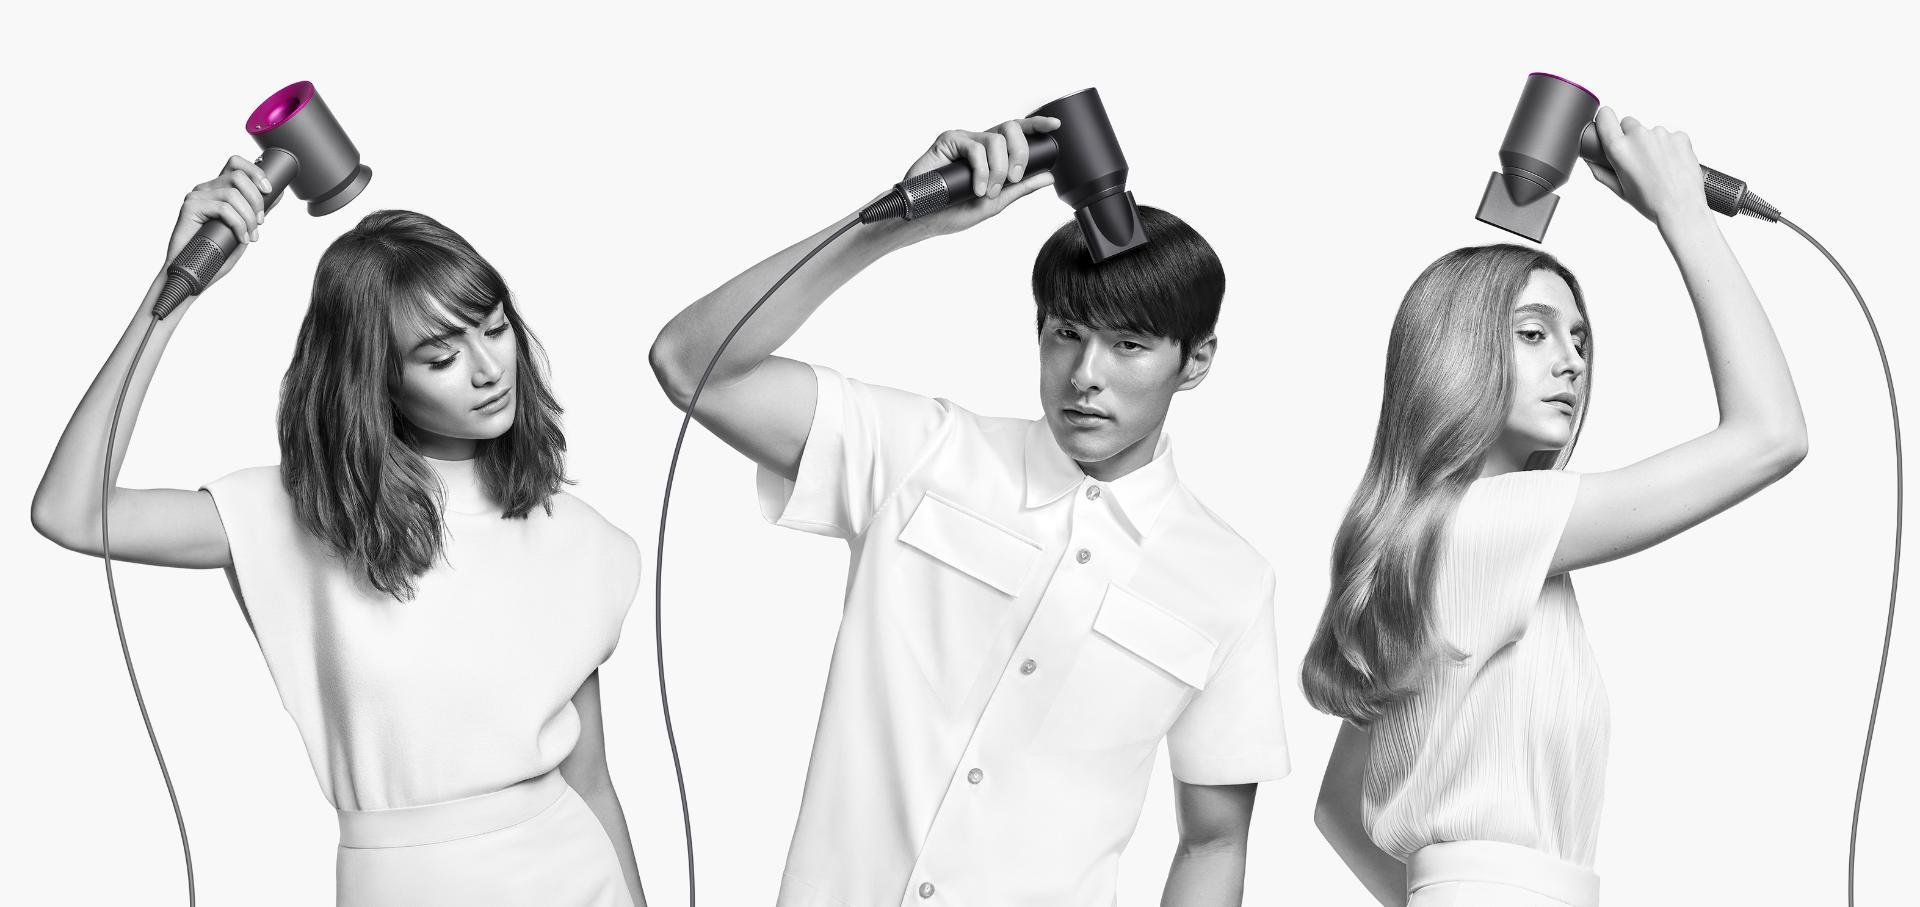 Three women using Dyson Supersonic hair dryers